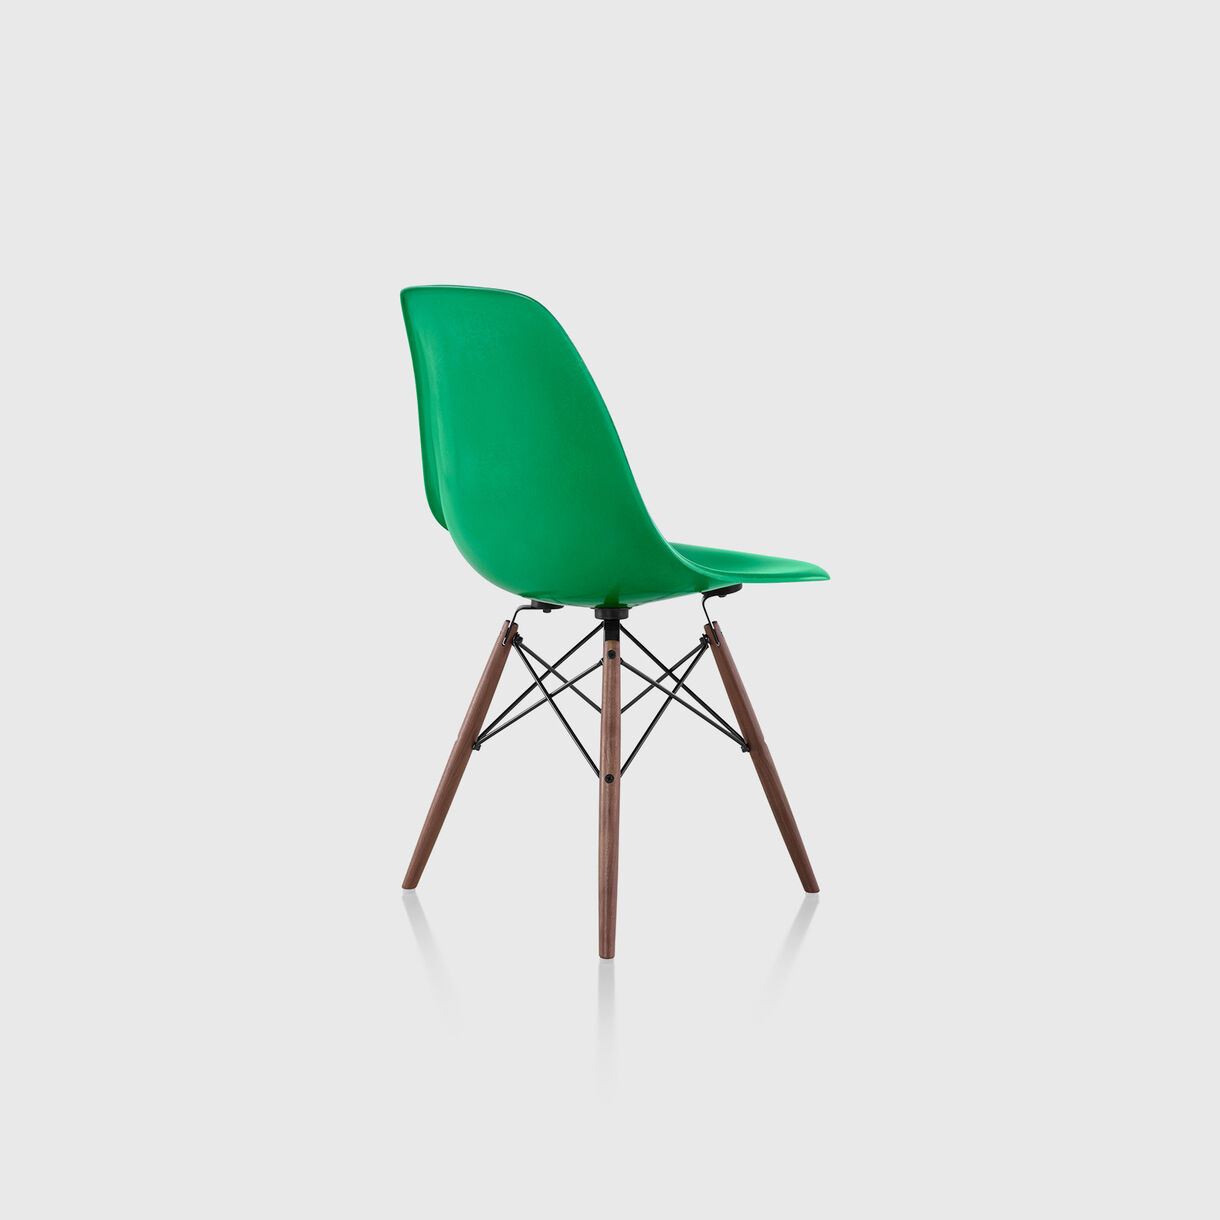 Eames Moulded Fibreglass Side Chair, Dowel Base